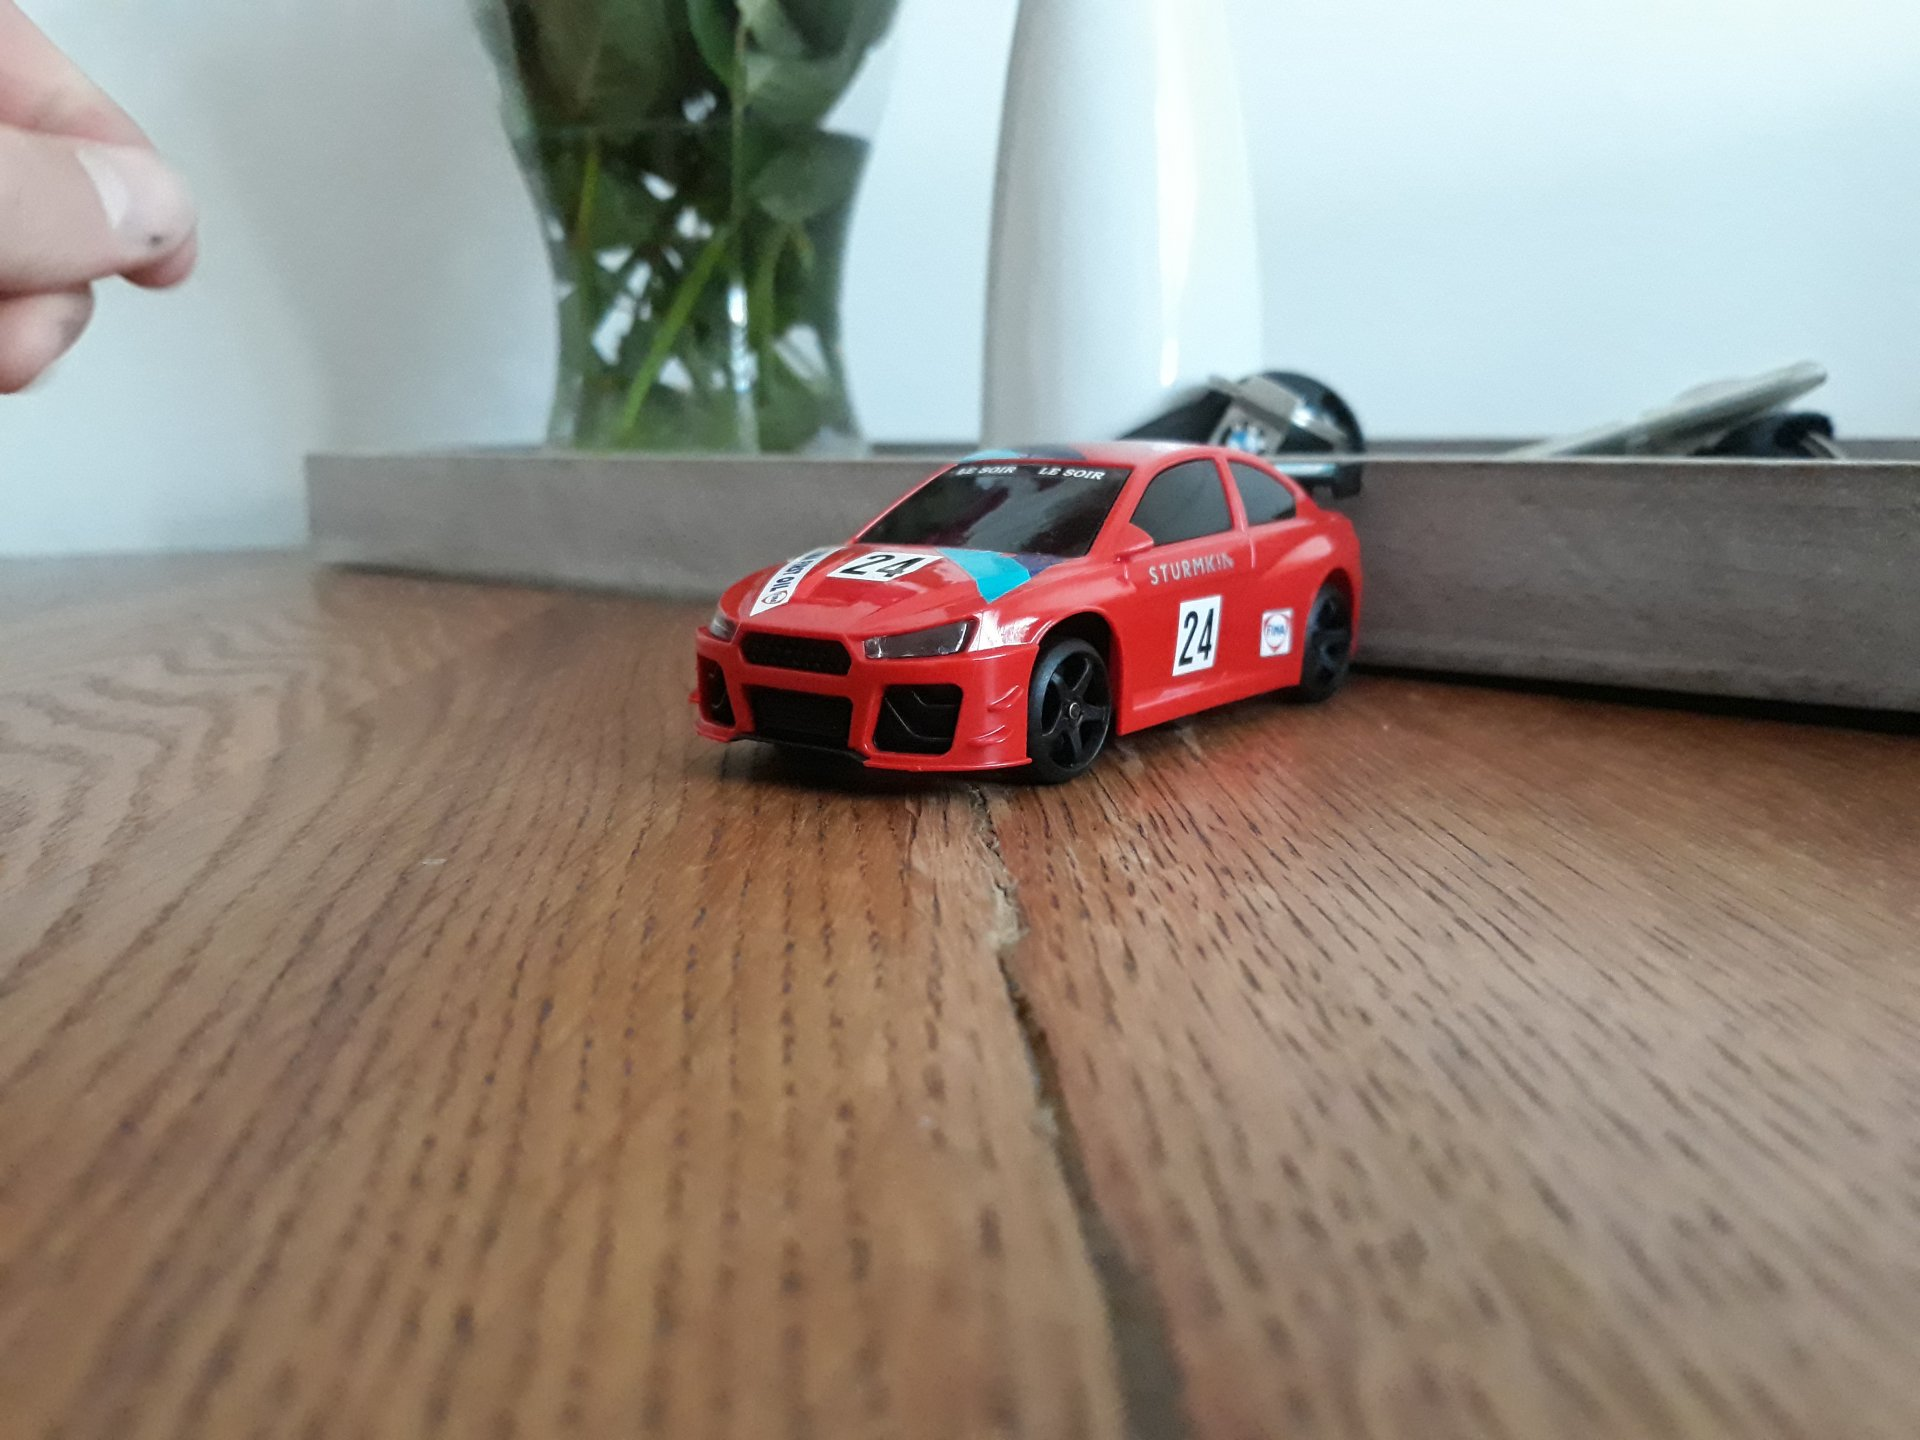 Mein Racer